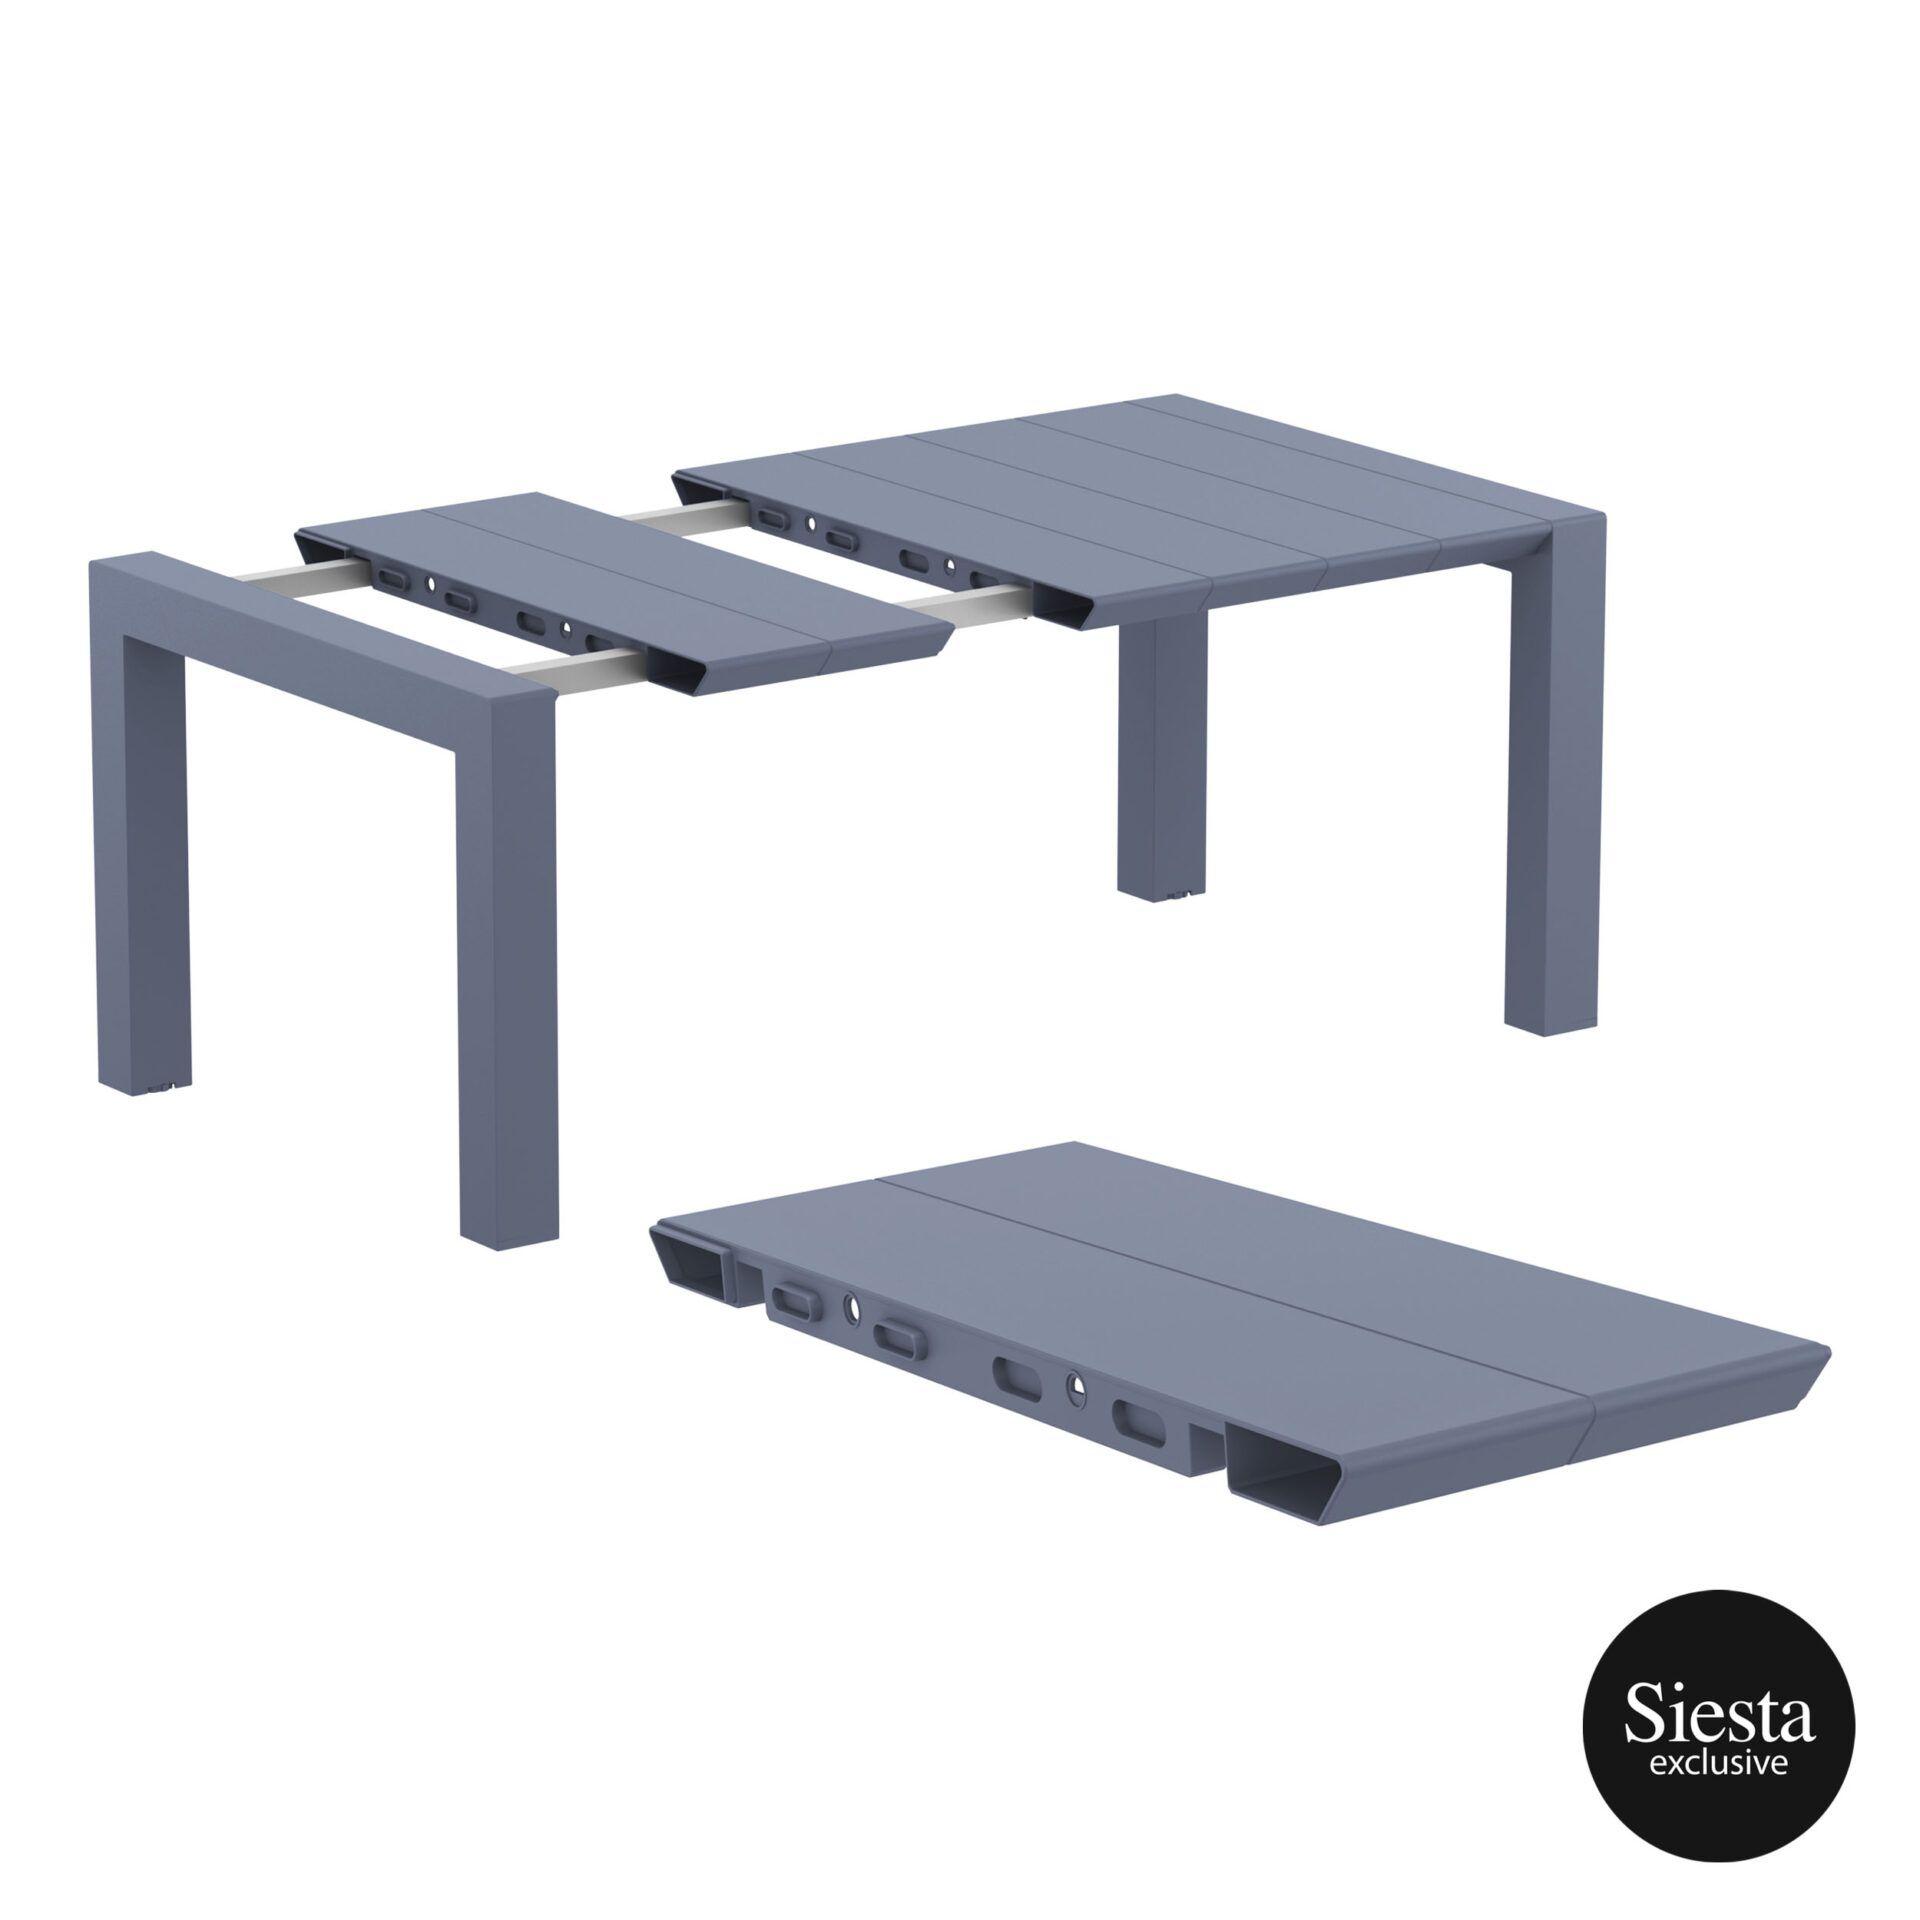 005 vegas table 140 darkgrey extension part